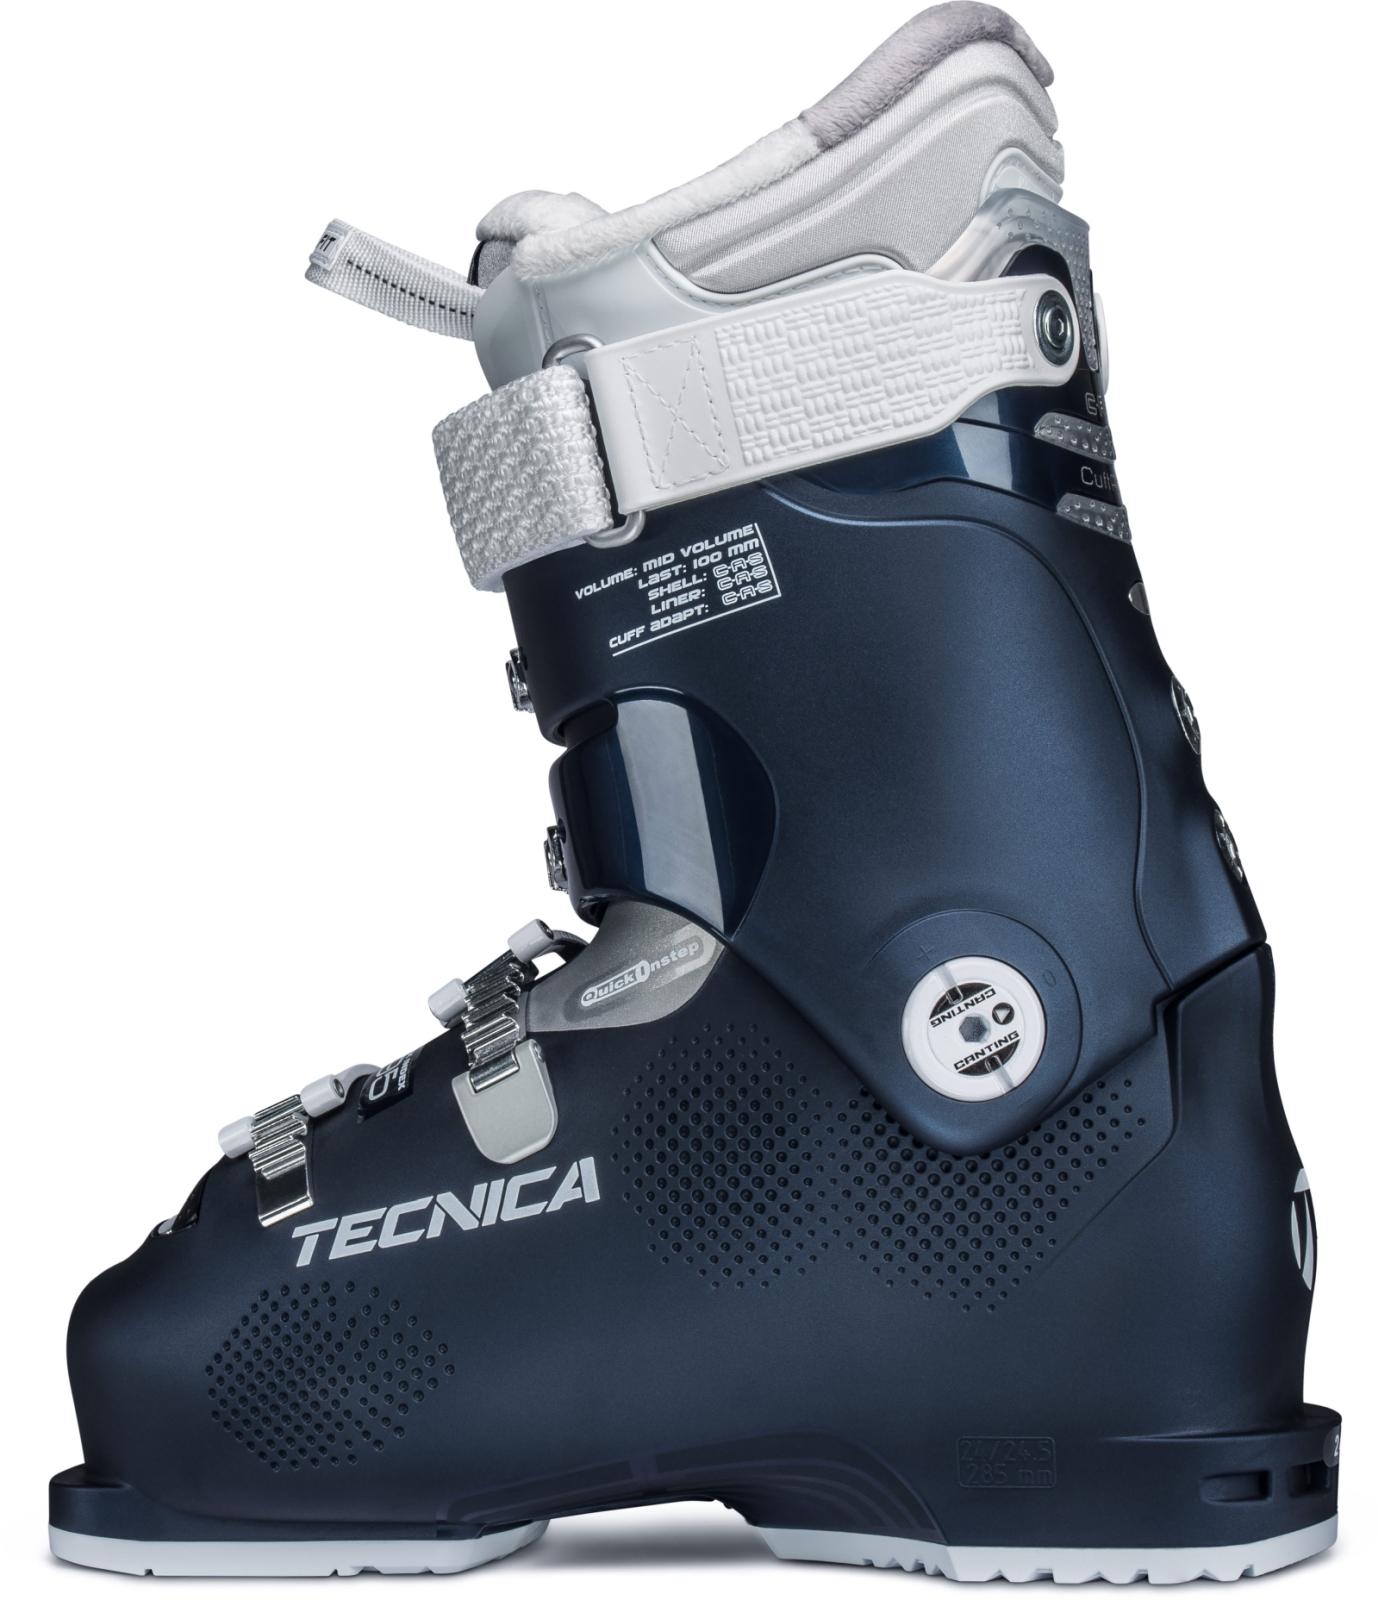 f2f782e9b23 Dámské lyžařské boty Tecnica Mach1 95 W MV - night blue - Ski a Bike ...